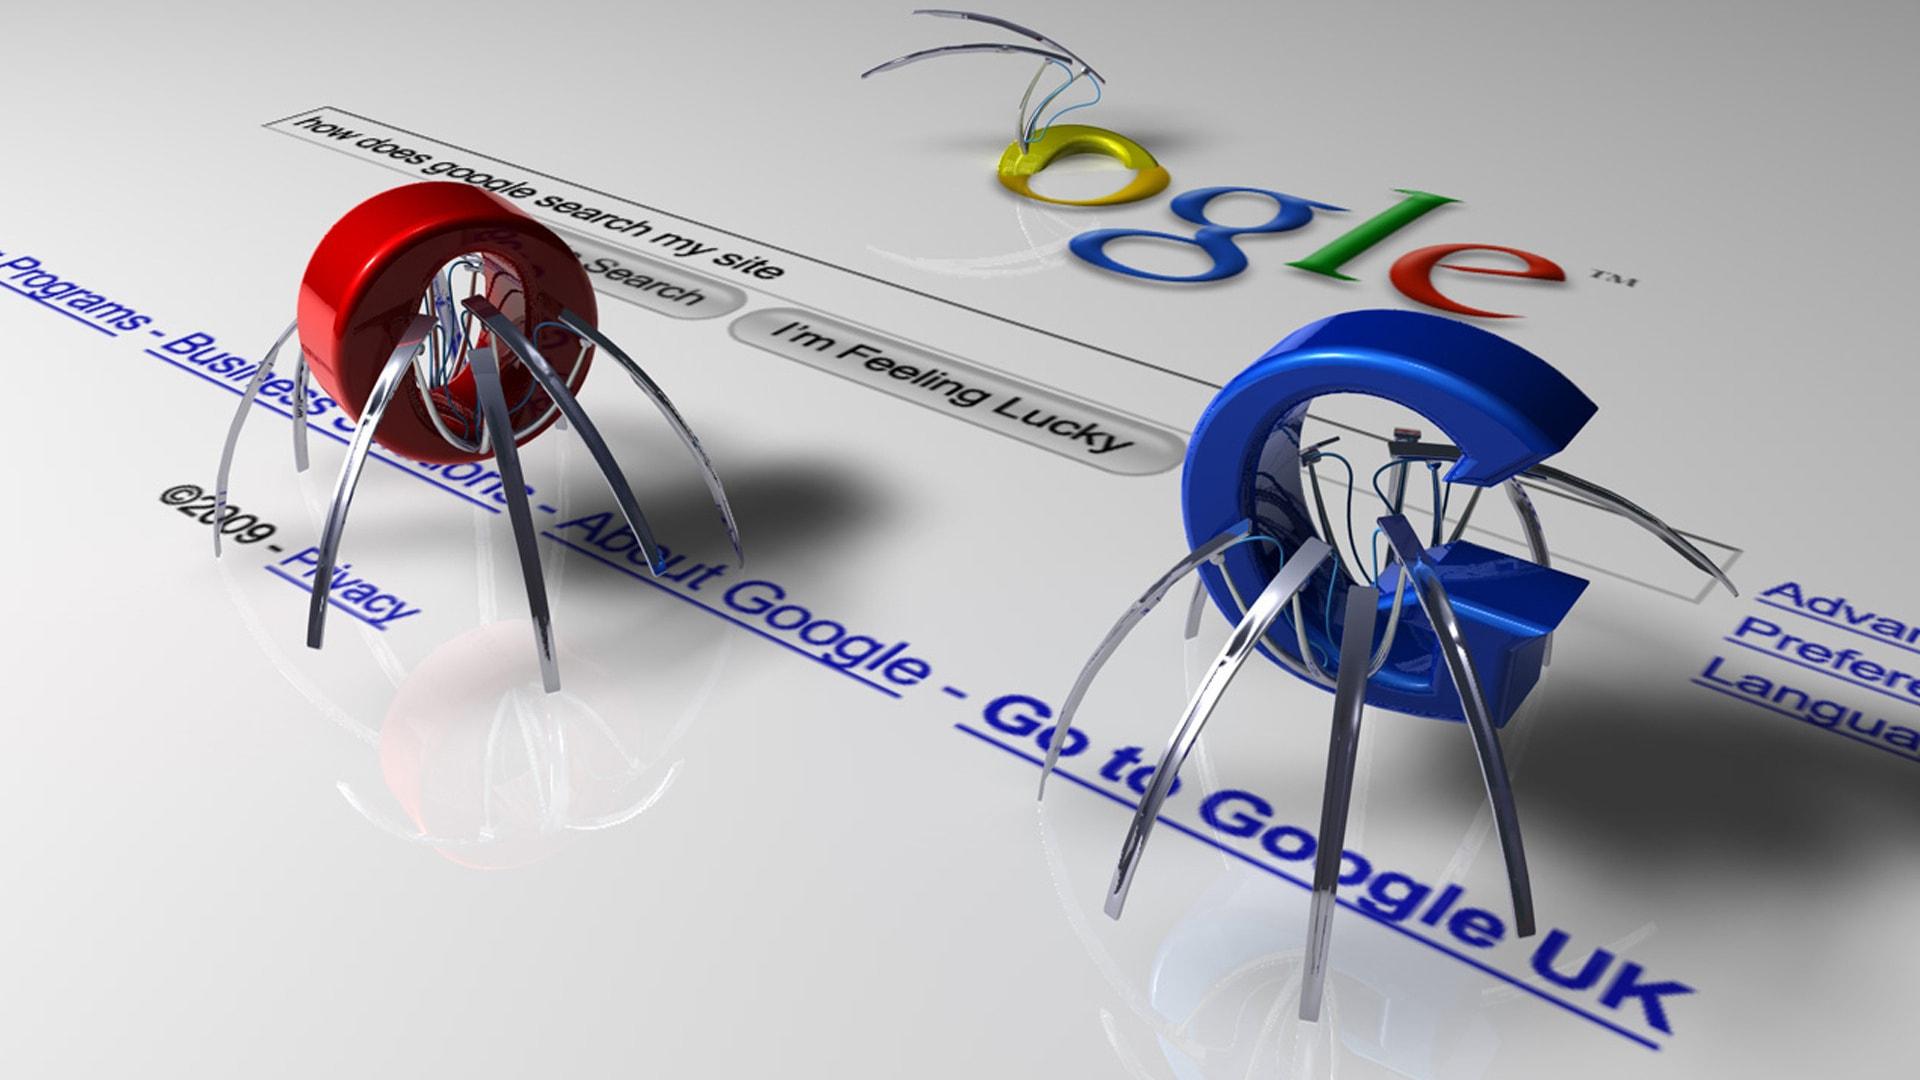 Google Hd Wallpapers 7wallpapers Net